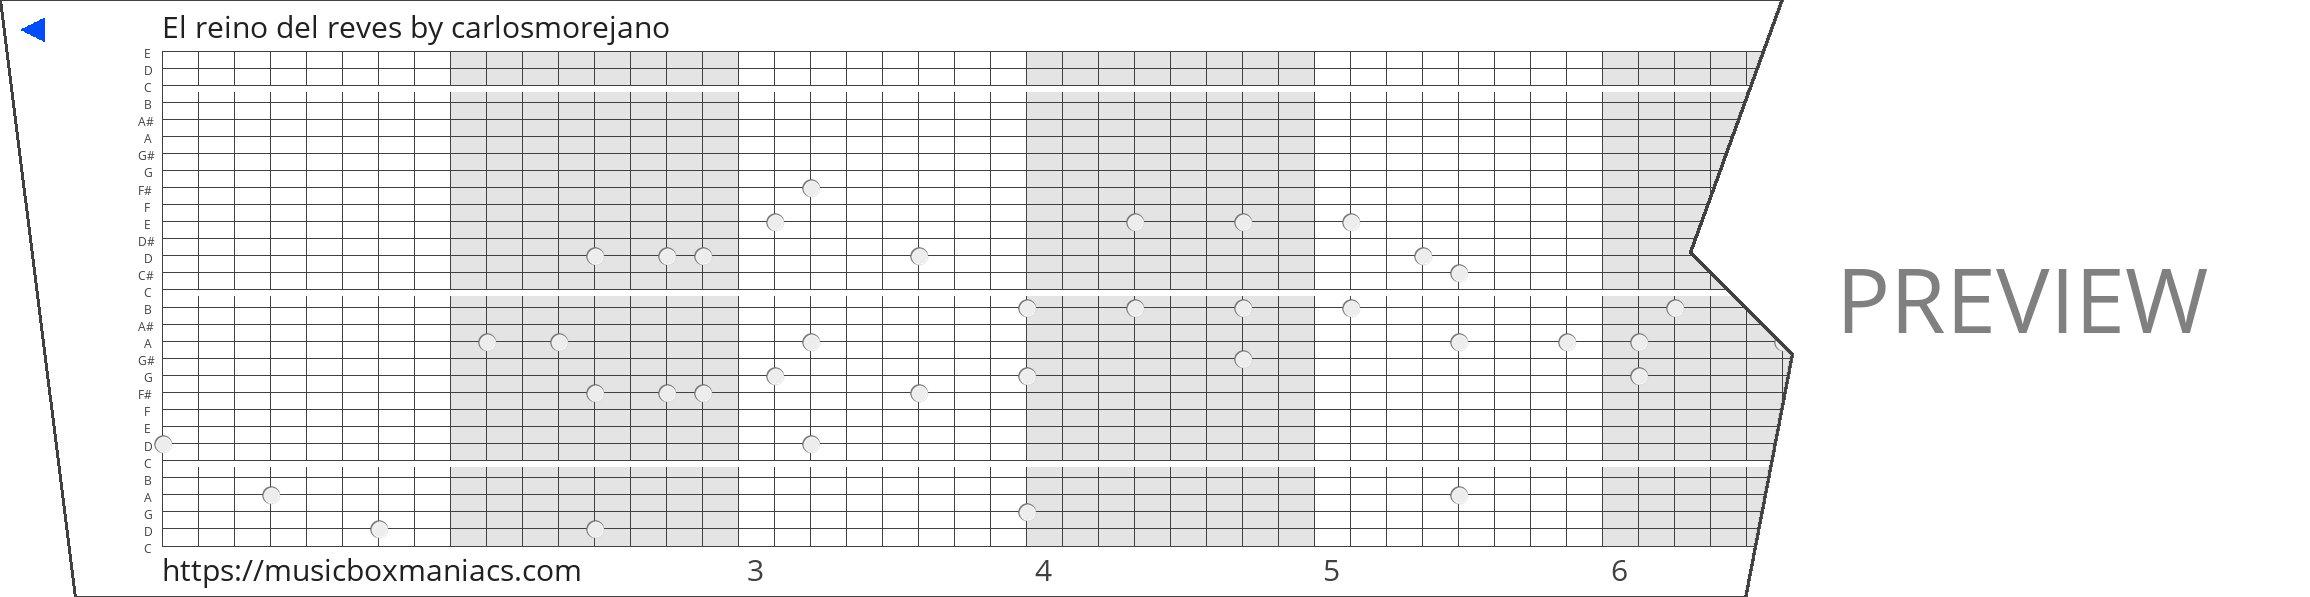 El reino del reves 30 note music box paper strip